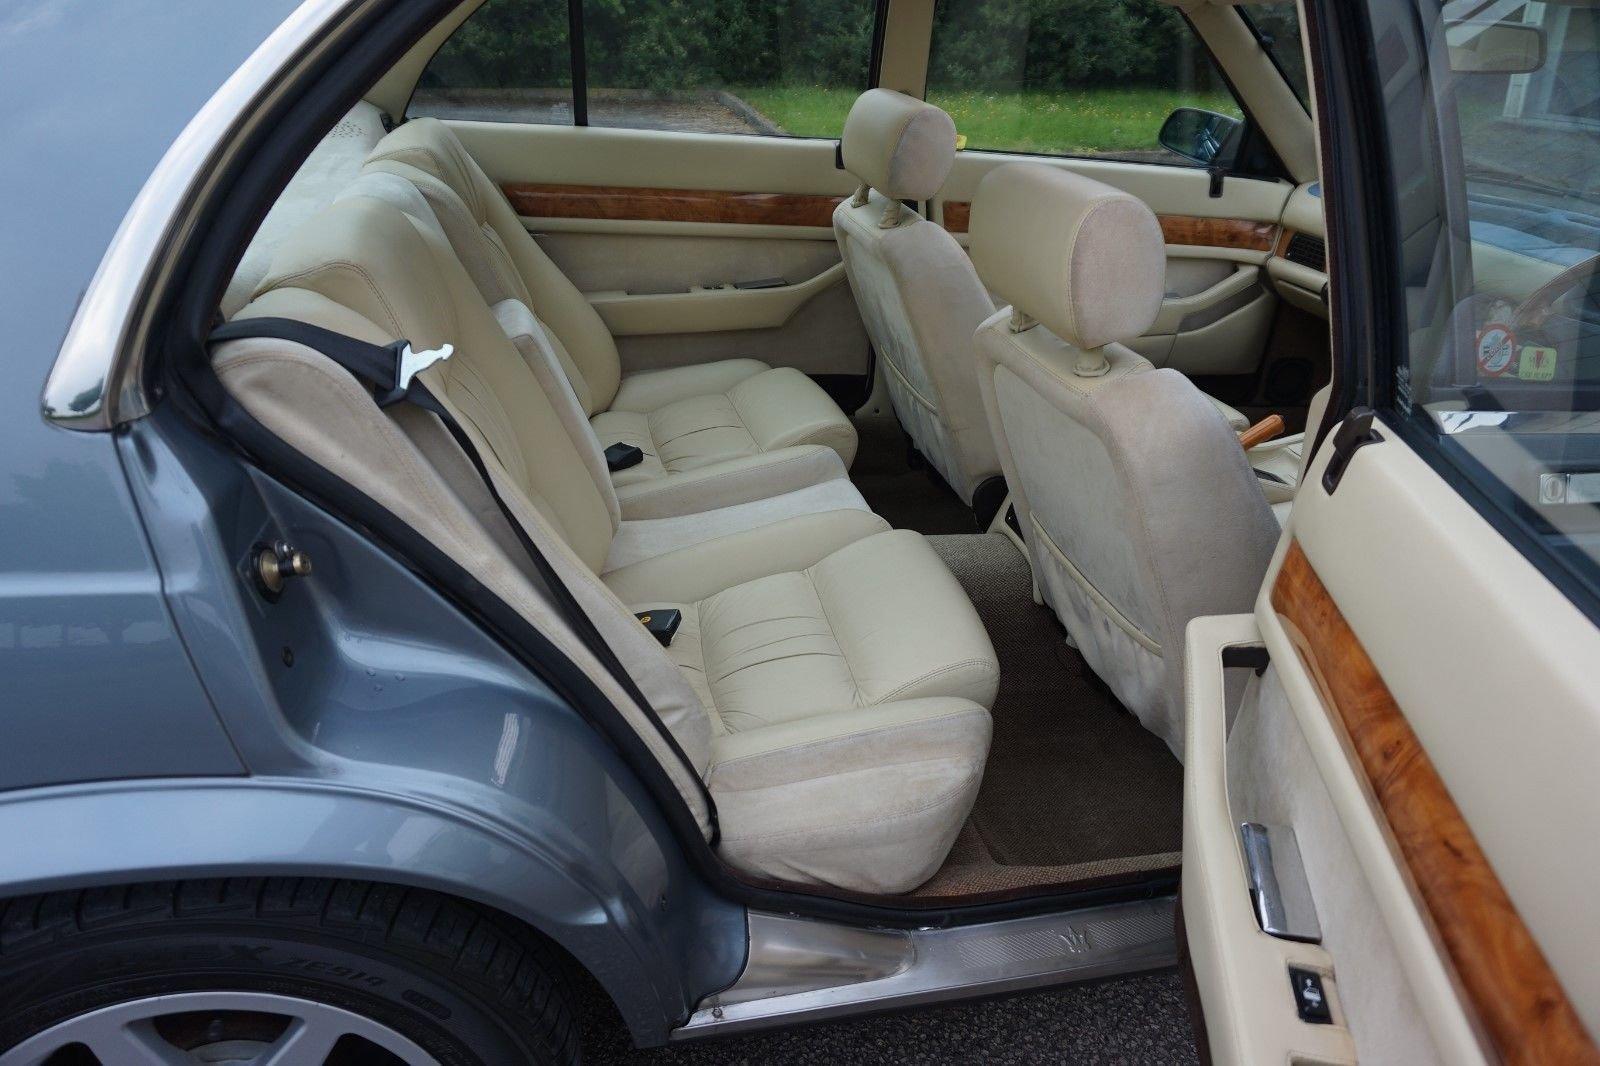 1989 Maserati biturbo 430 25300 miles RHD new MOT +Belt For Sale (picture 5 of 6)